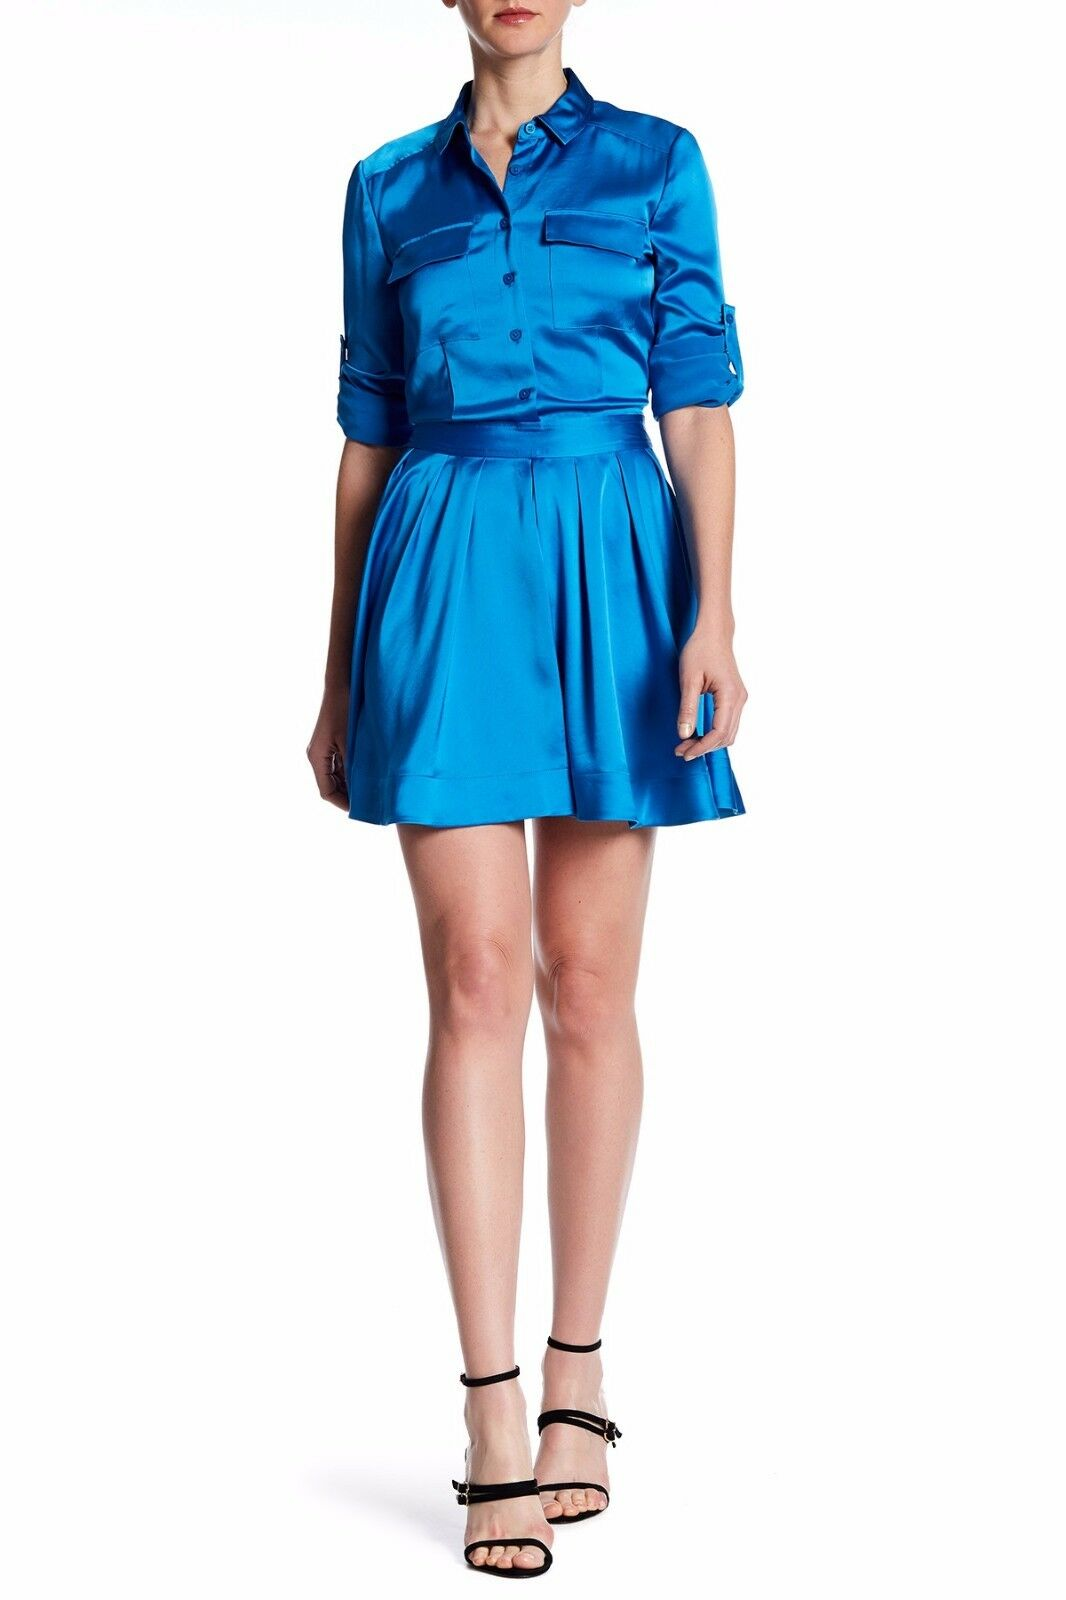 NWT DKNY WOMEN Sz8 LONG SLEEVE SATIN PLEATED SHIRT DRESS CERULEAN blueE